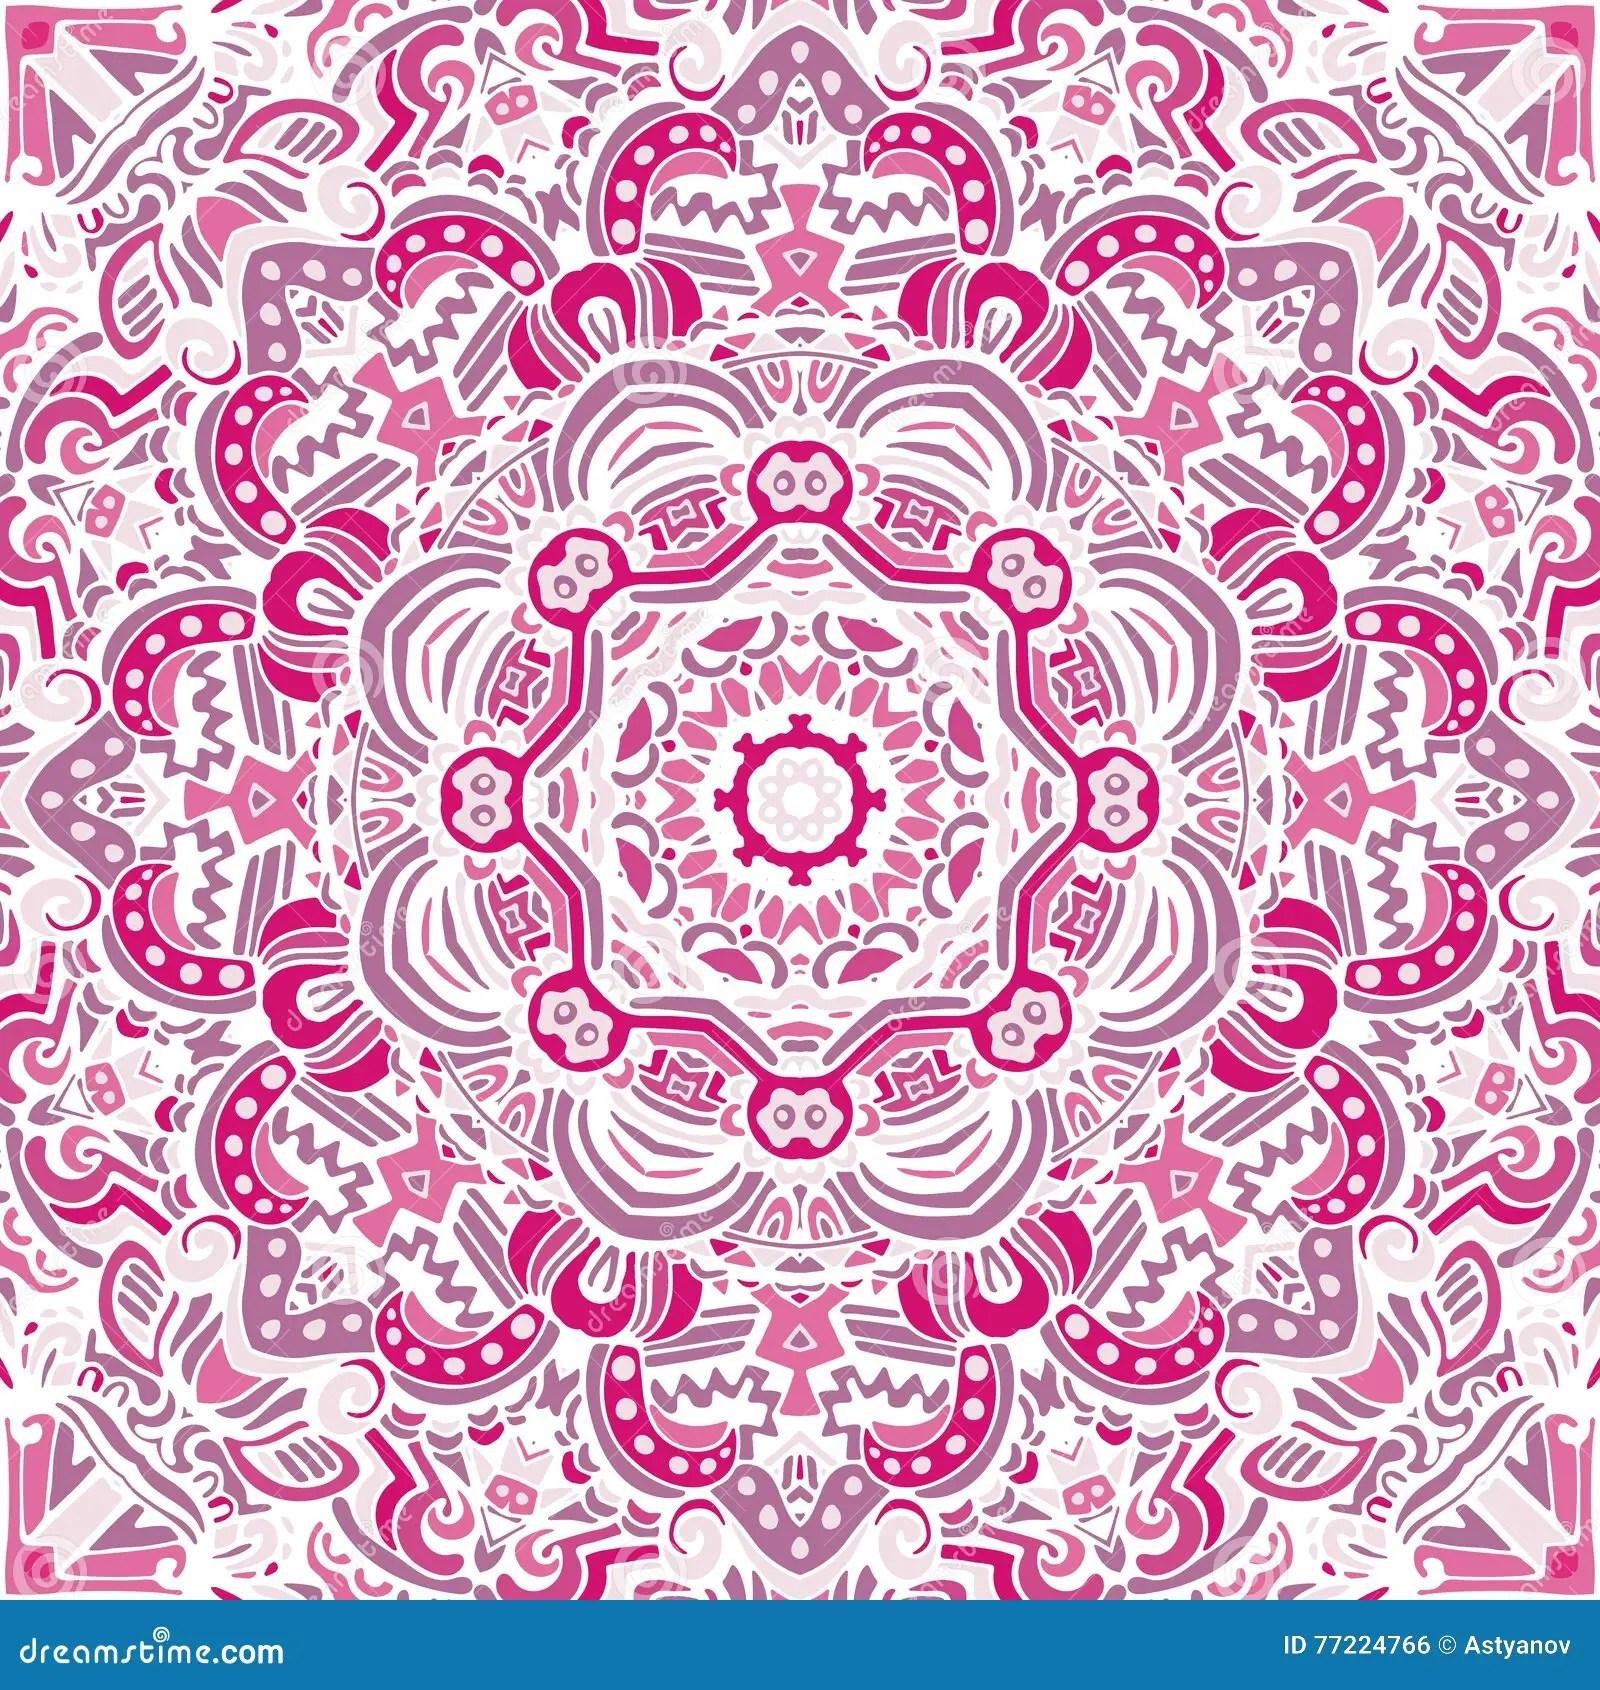 Pinterest Desktop Wallpaper Lotus Quote Fondo Rosado De La Mandala Del Vintage Ilustraci 243 N Del